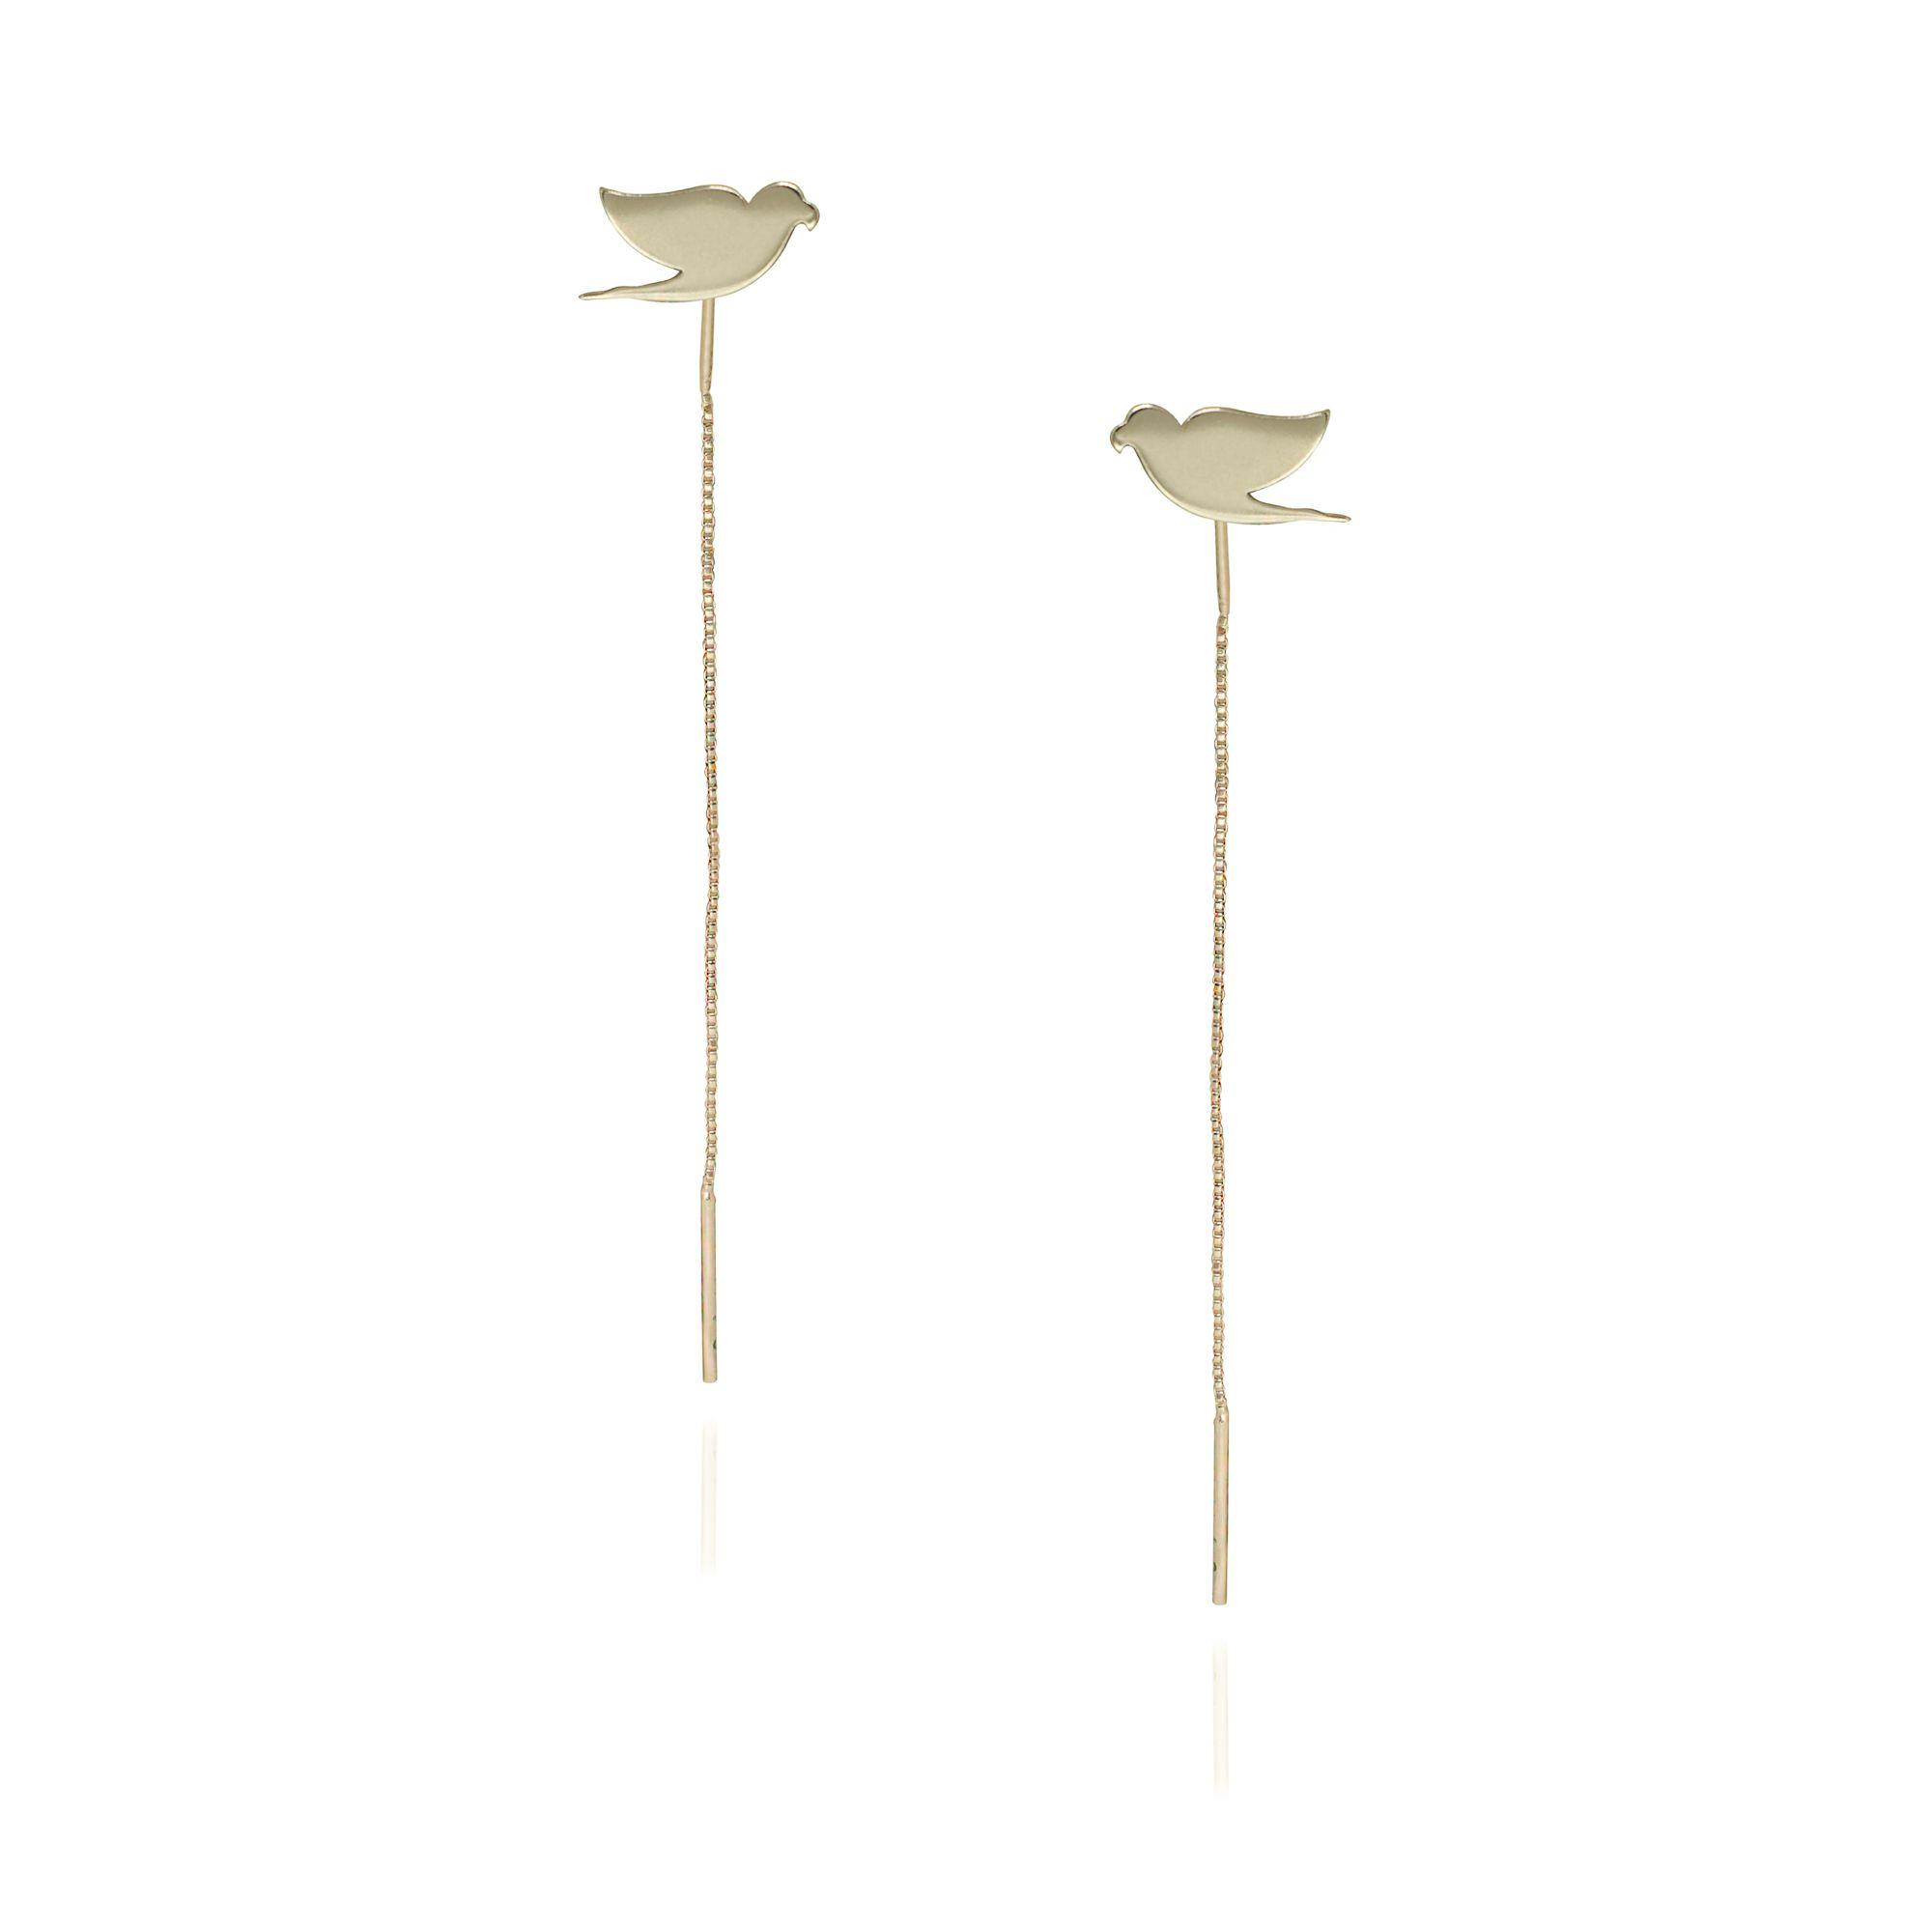 Brinco folheada semijoia minimalista Arara e corrente